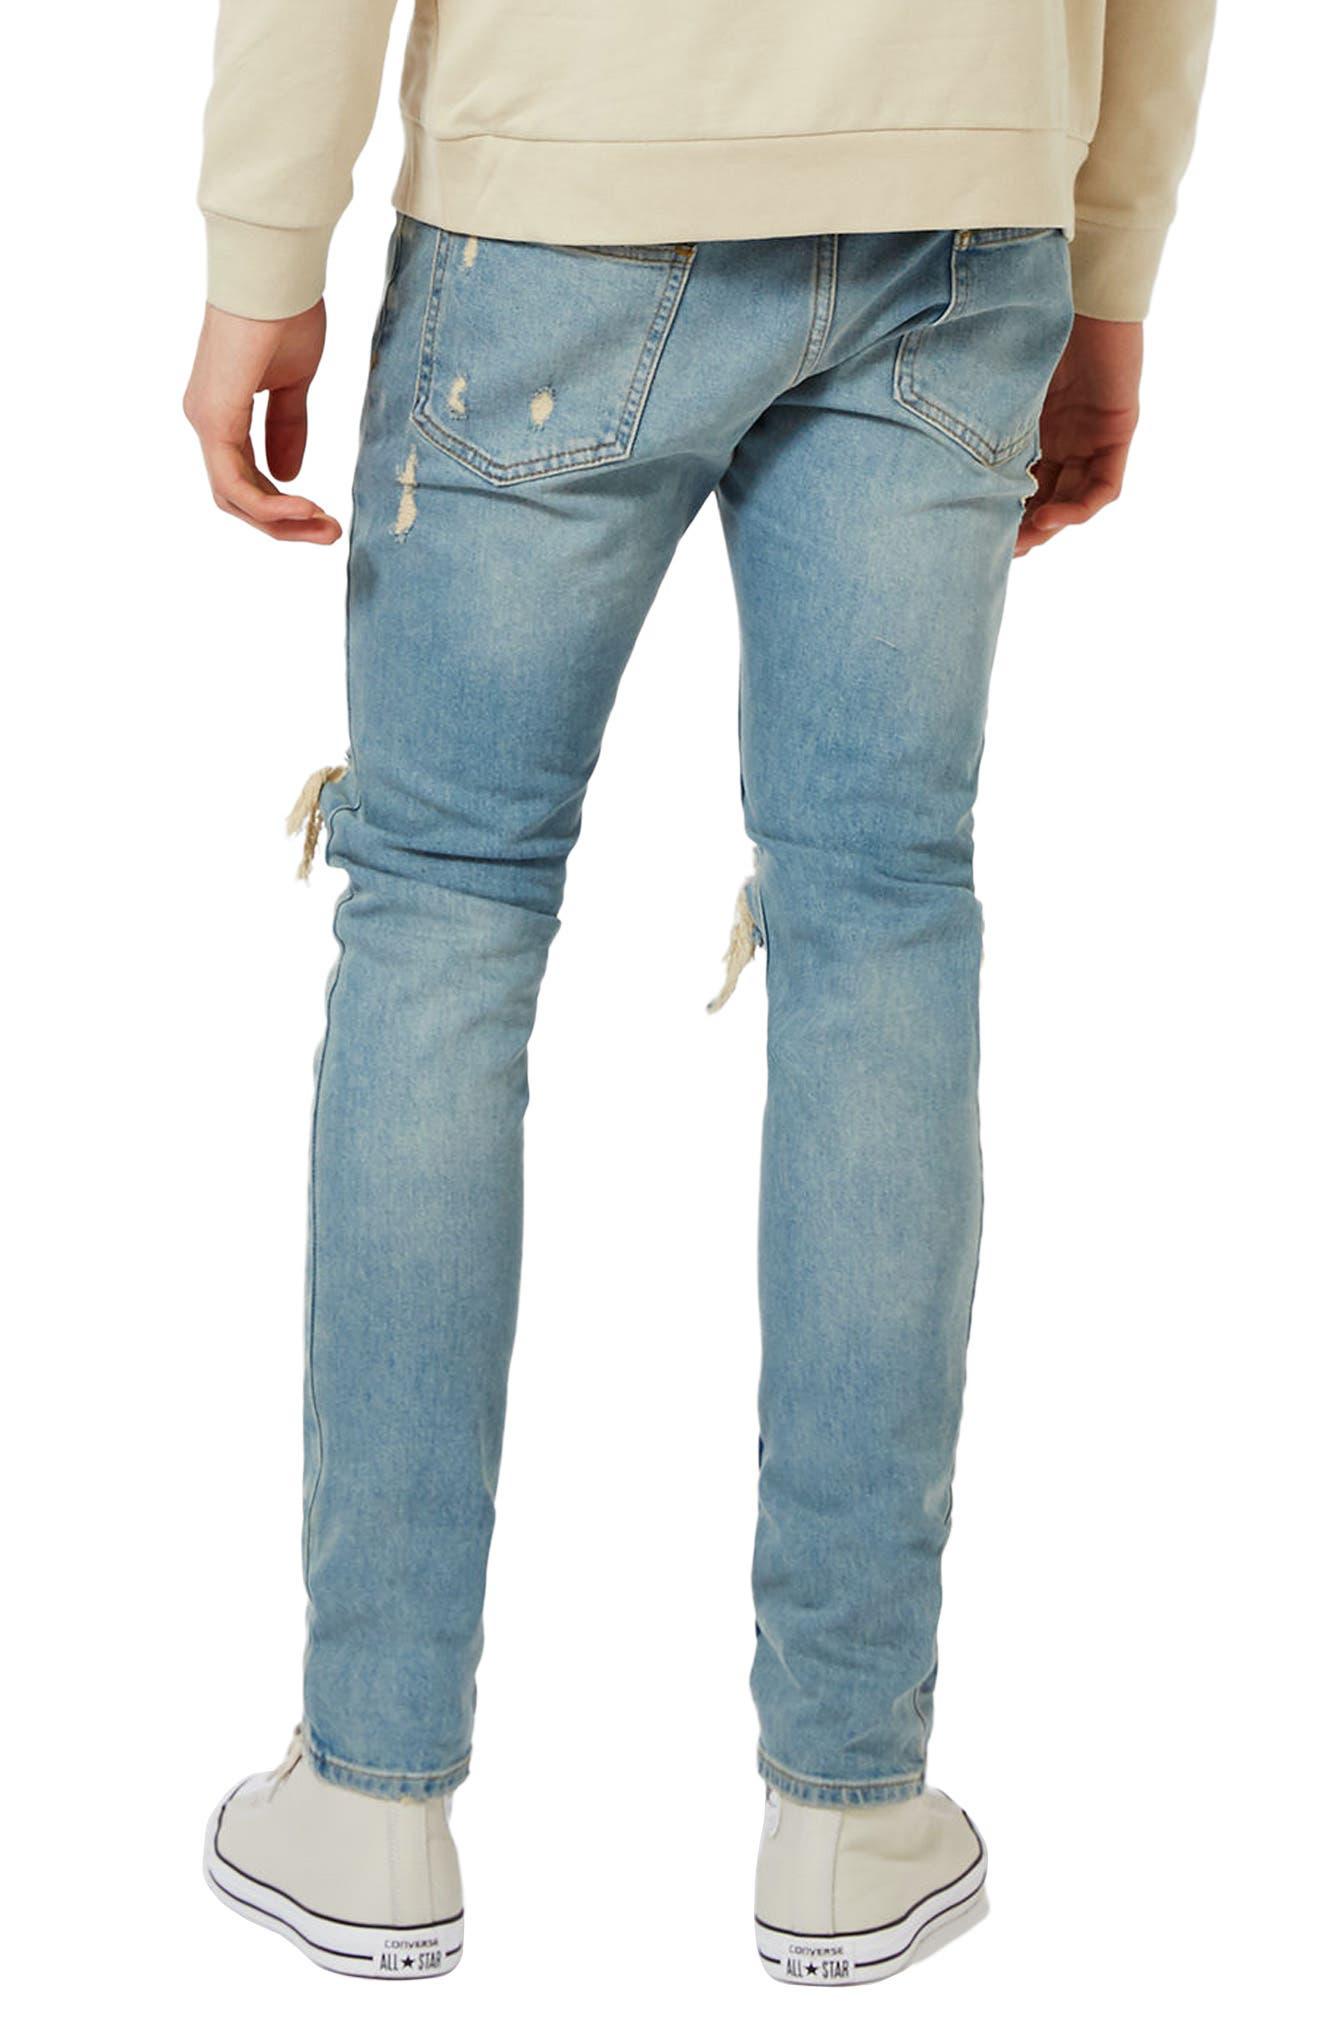 Ripped Stretch Skinny Jeans,                             Alternate thumbnail 2, color,                             LIGHT WASH DENIM